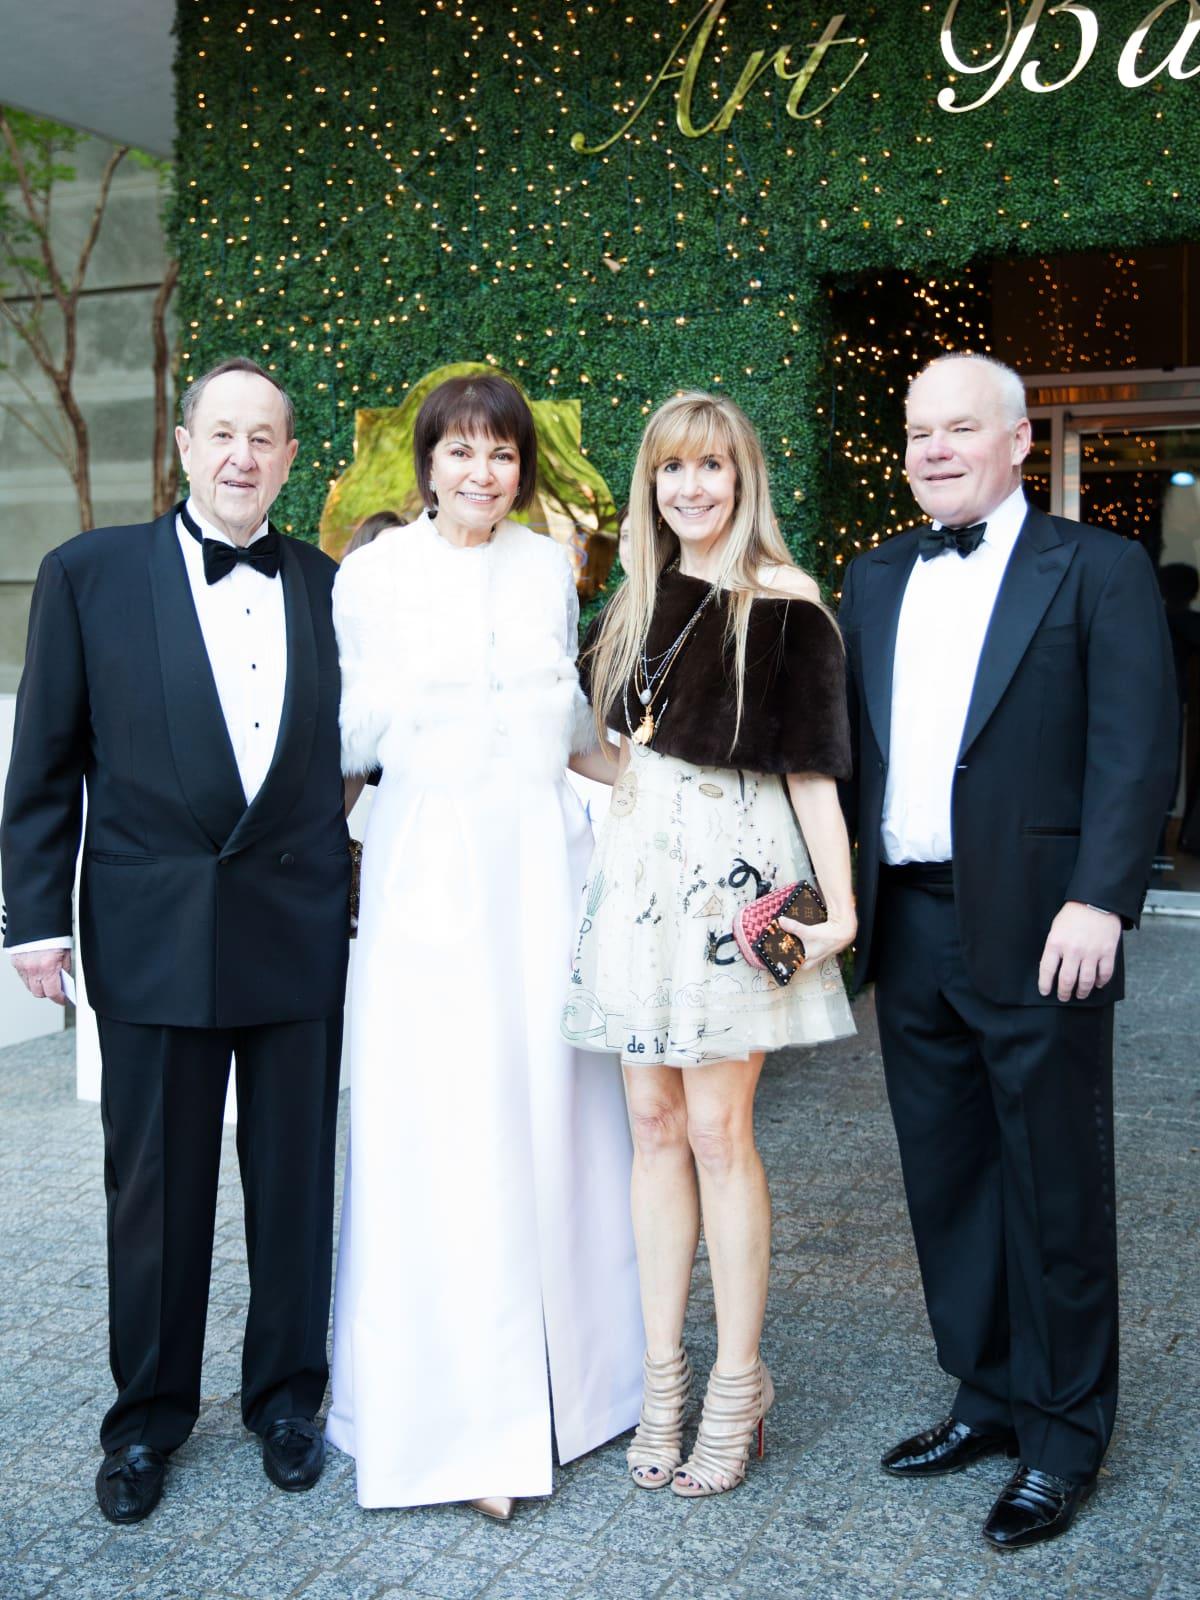 Peter Roberts, Jennifer Roberts, Nancy Carlson, Clint Carlson